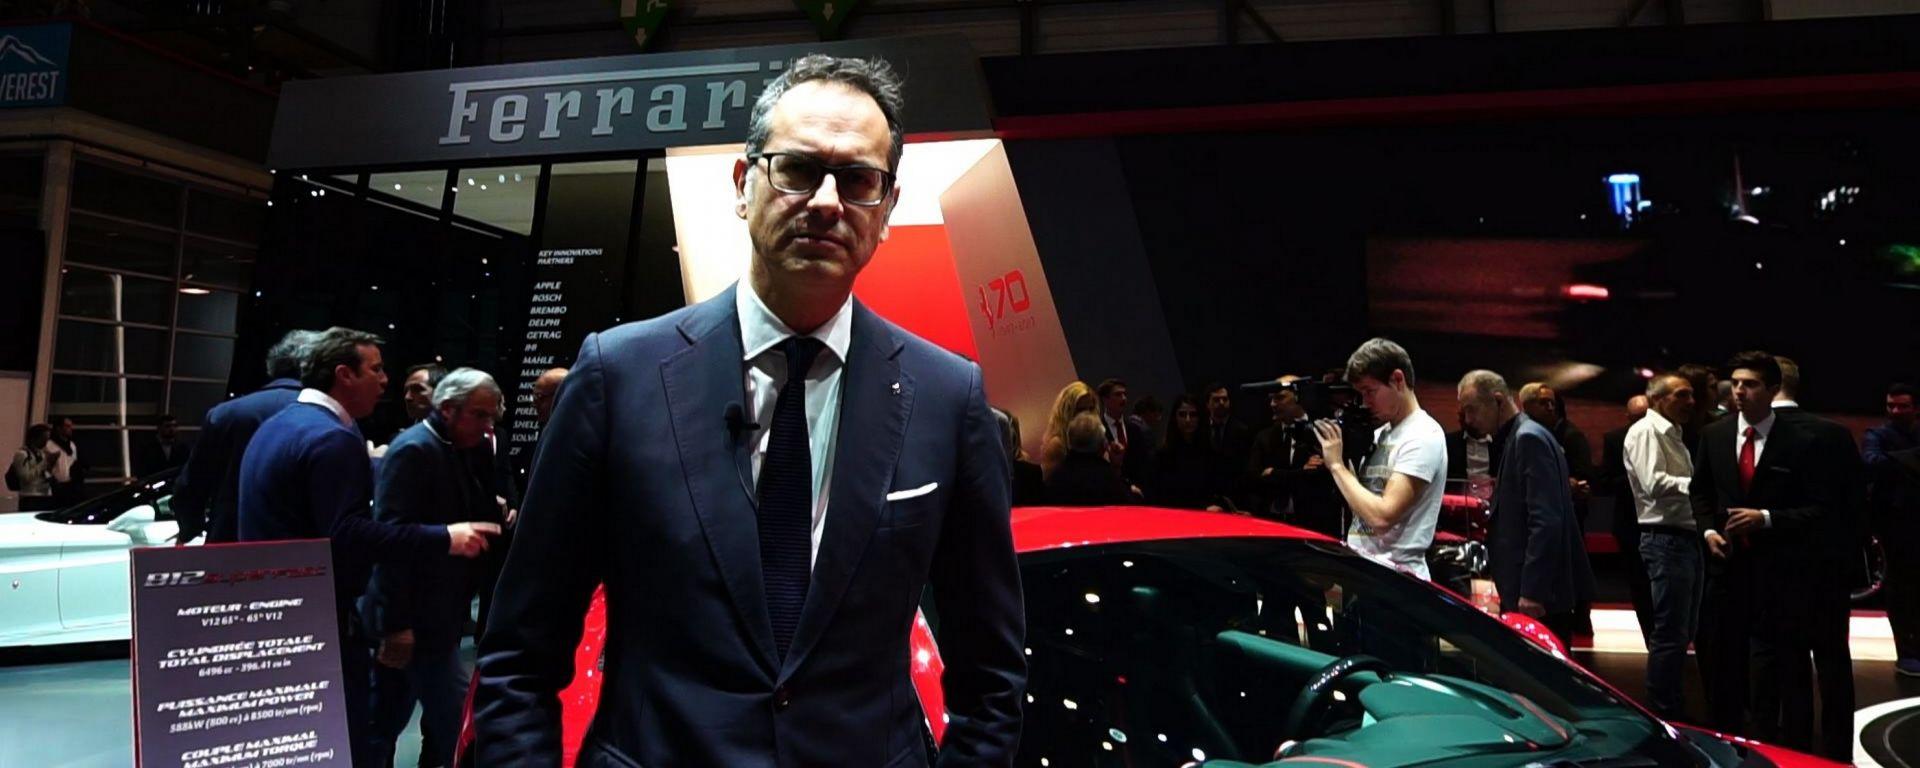 Ferrari 812 Superfast, Salone di Ginevra 2017, intervista a Flavio Manzoni